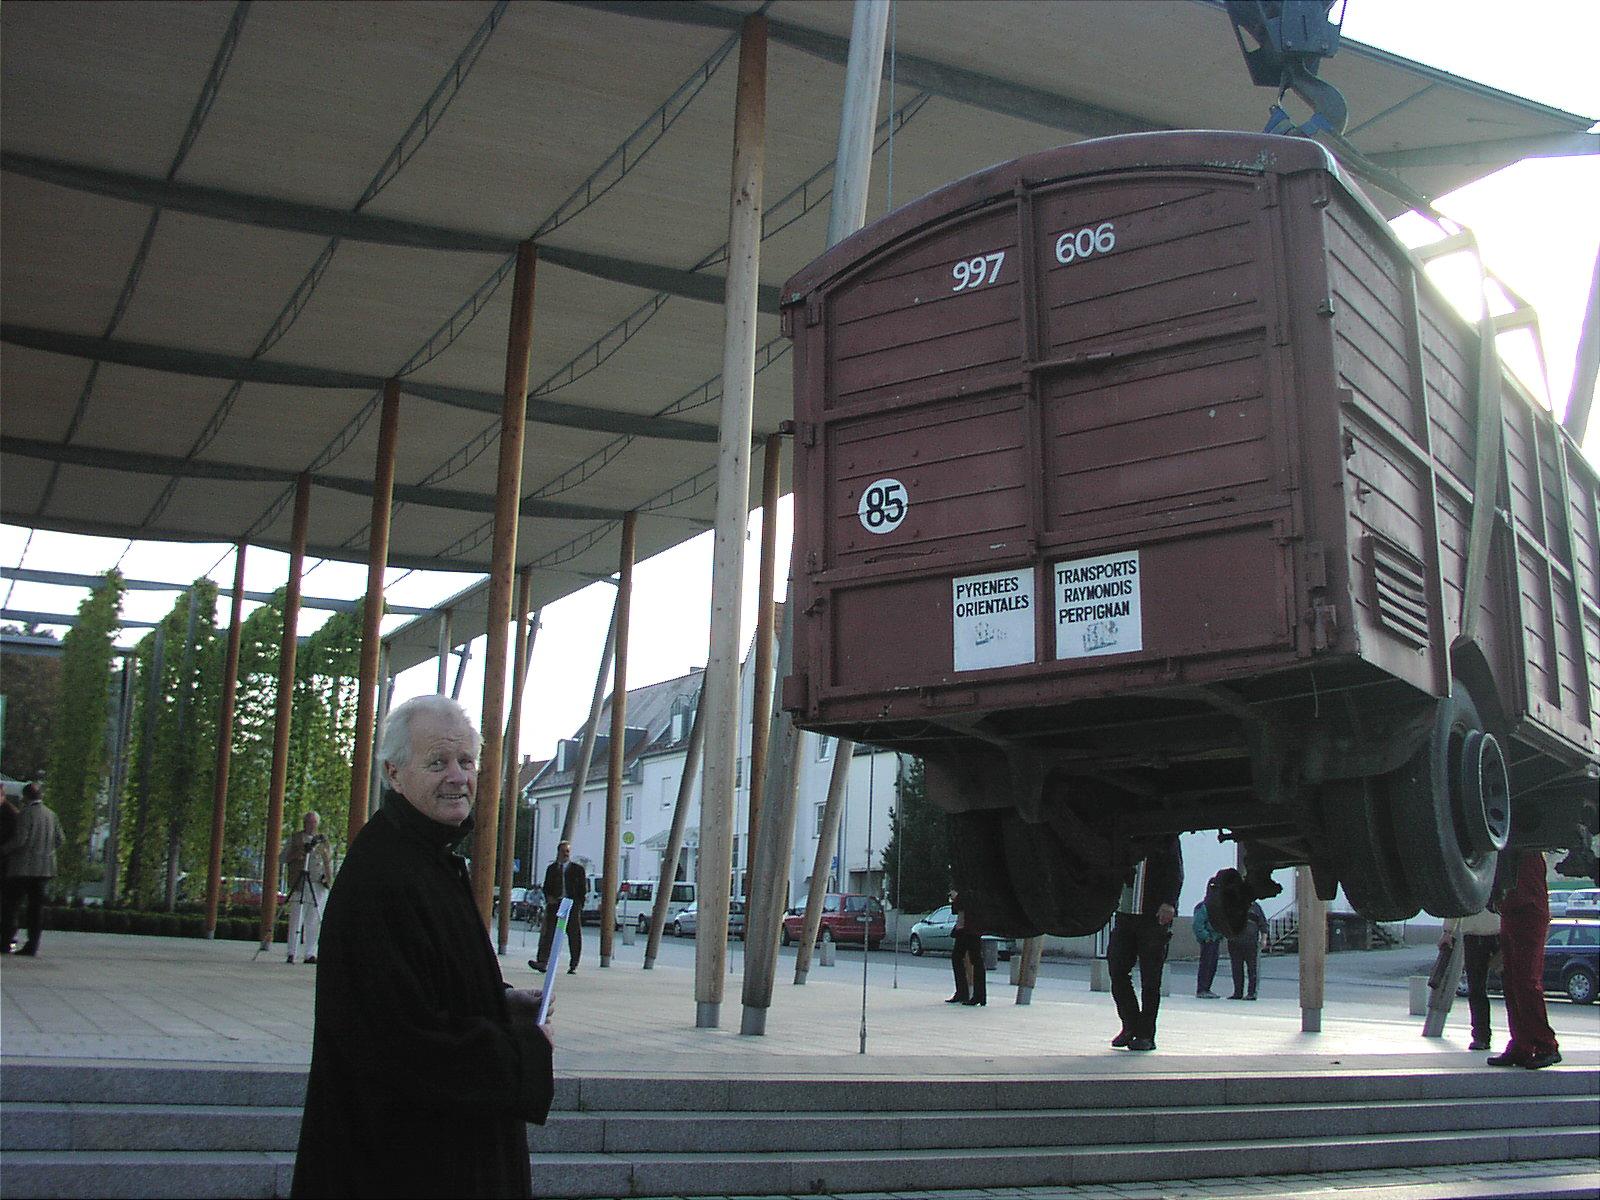 Dalis Original Railroad Art Car Leaves Perpignan U2013 European Art